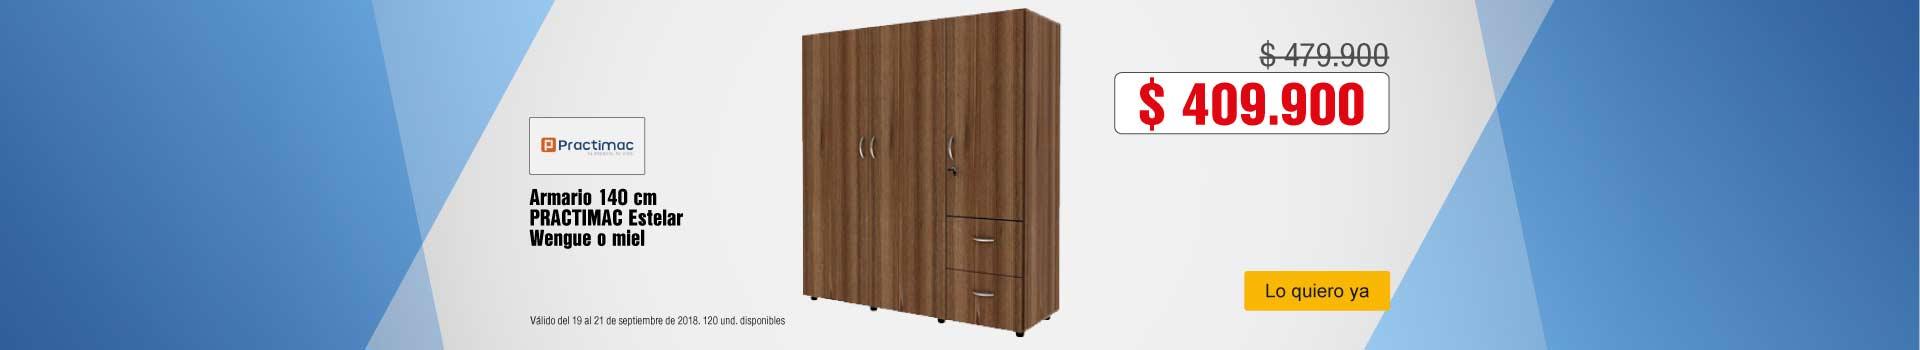 AK-BCAT-1-muebles-PP---practimac-armario-estelar-19sep